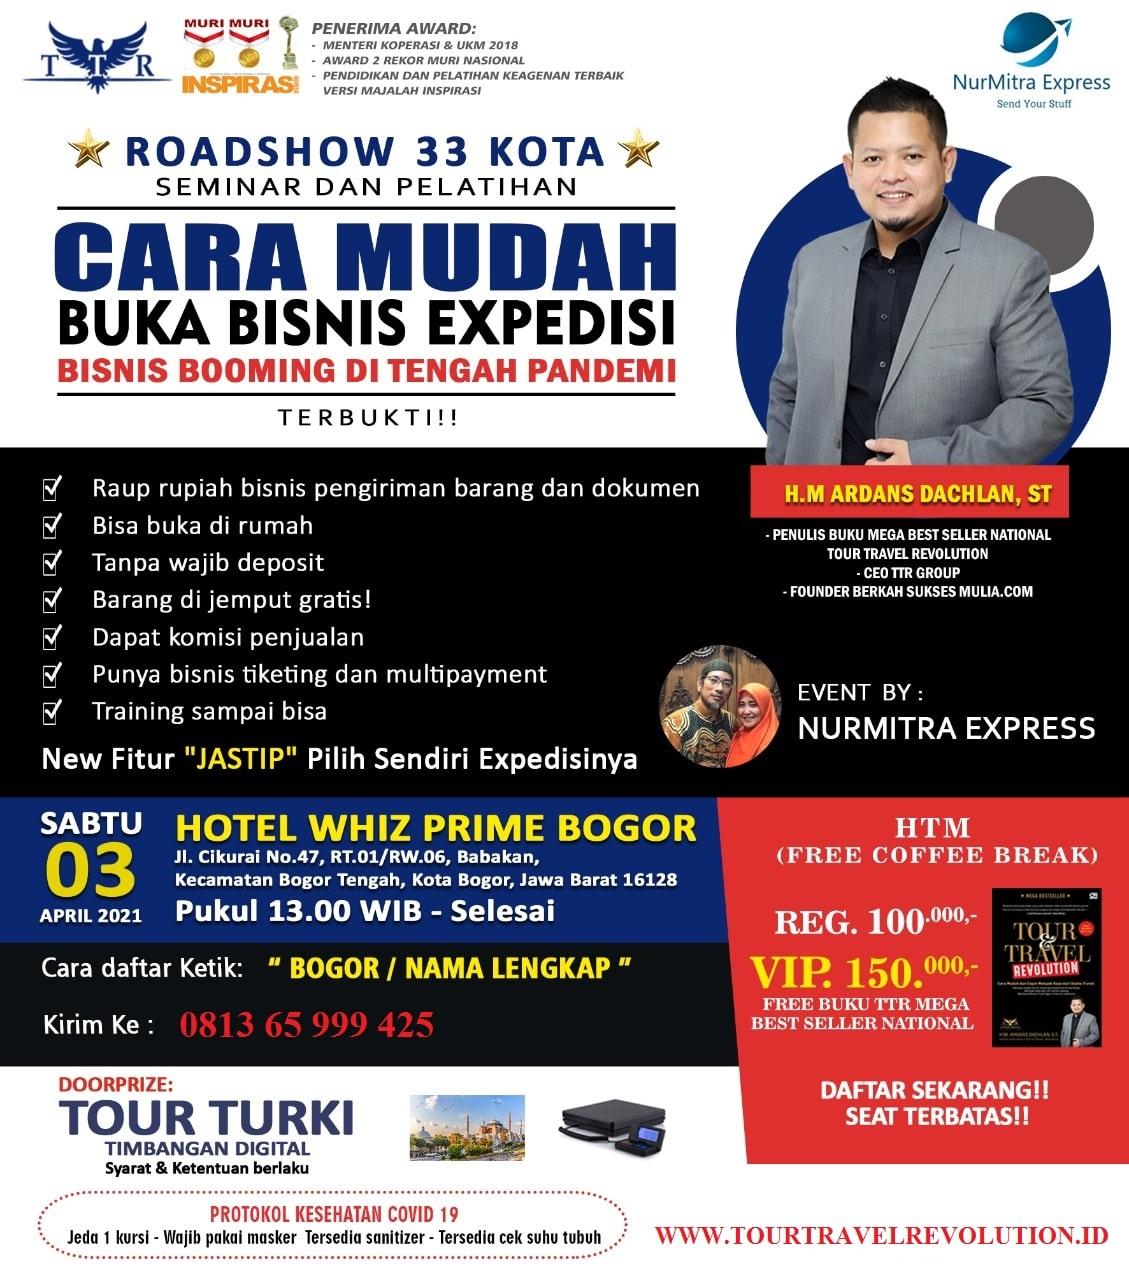 Seminar Multi Kurir Bogor